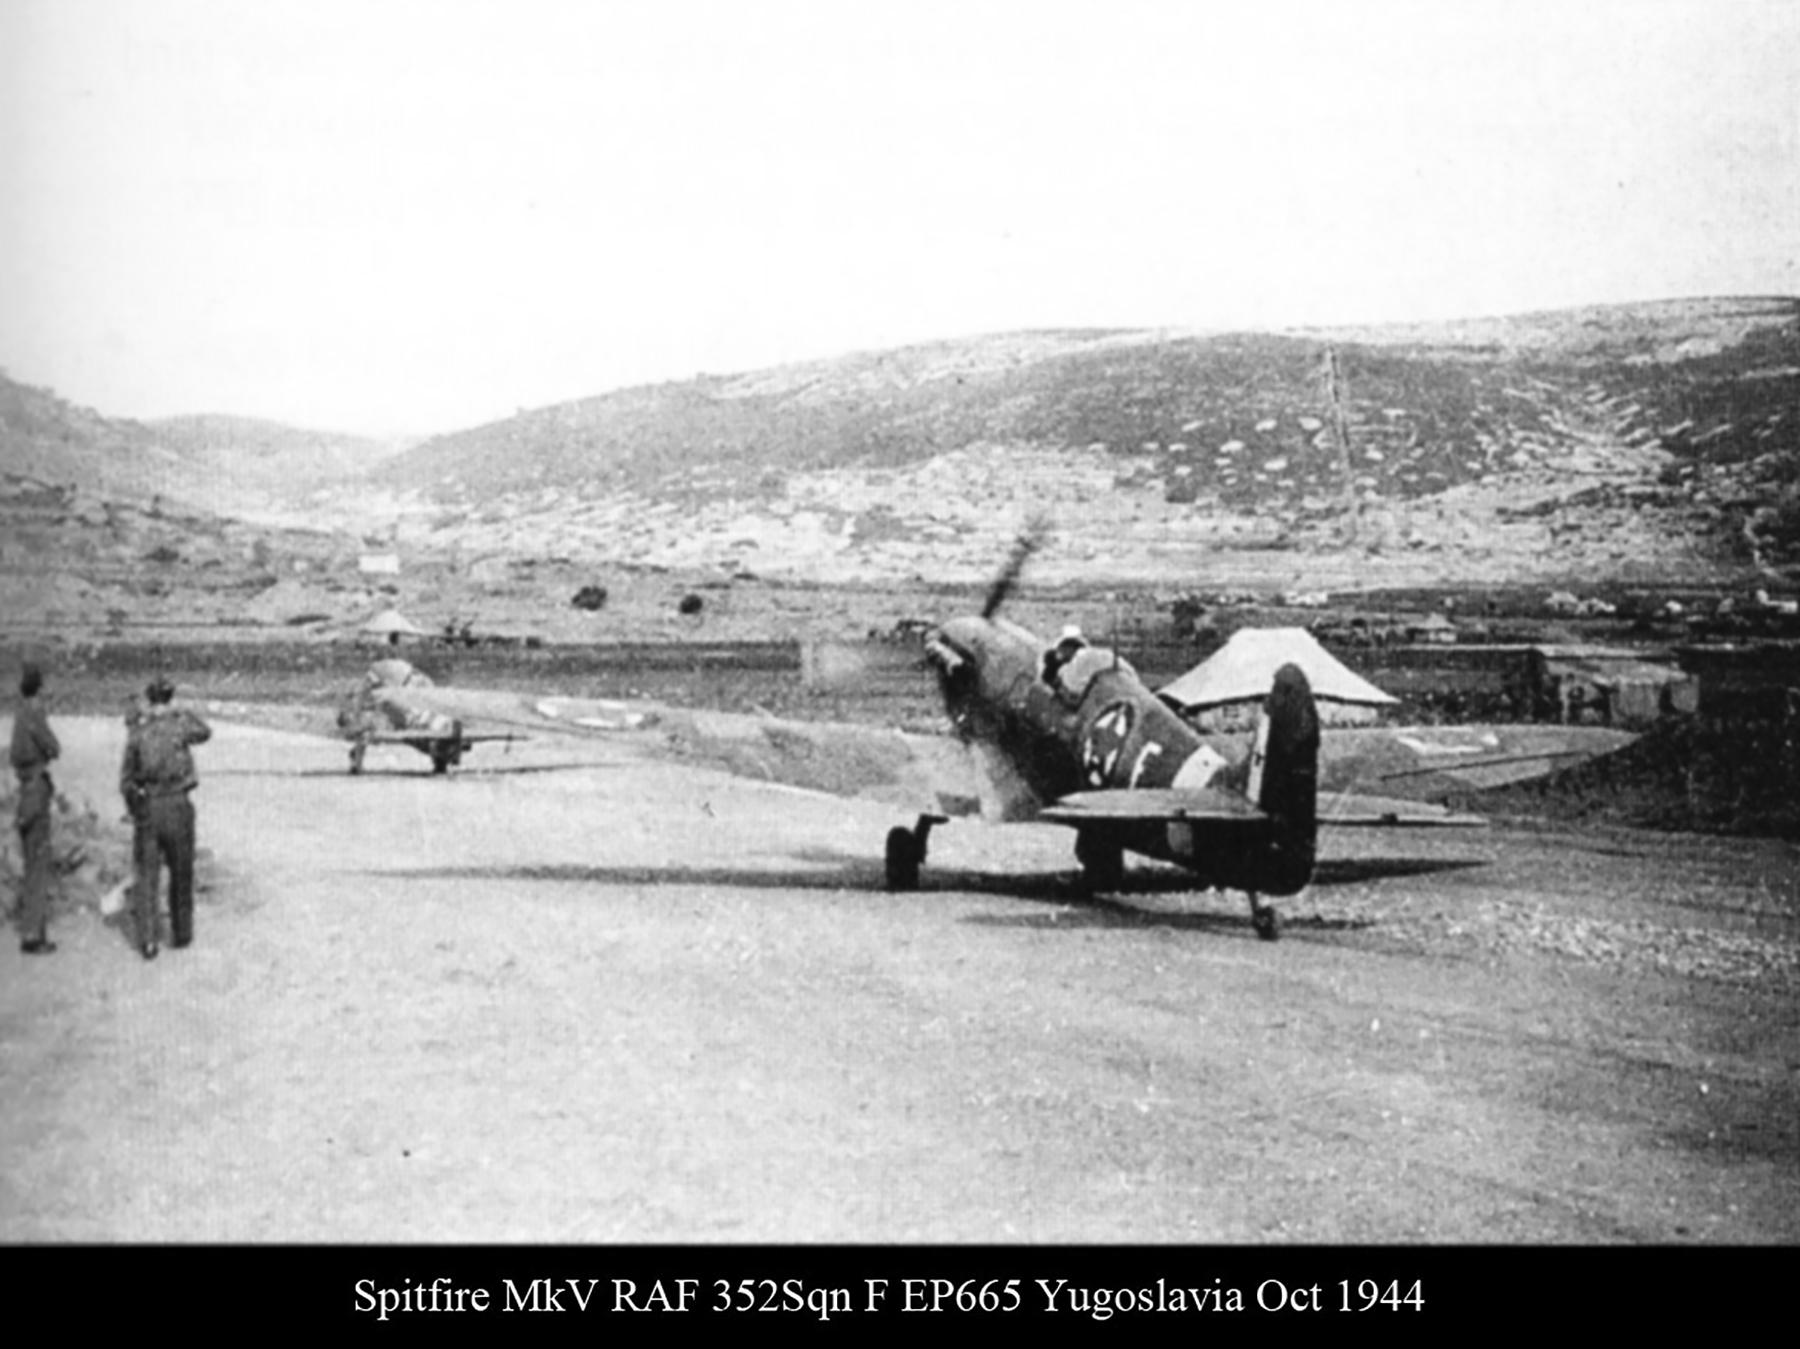 Spitfire MkVcTrop RAF 352Sqn F EP665 Yugoslavia Oct 1944 01